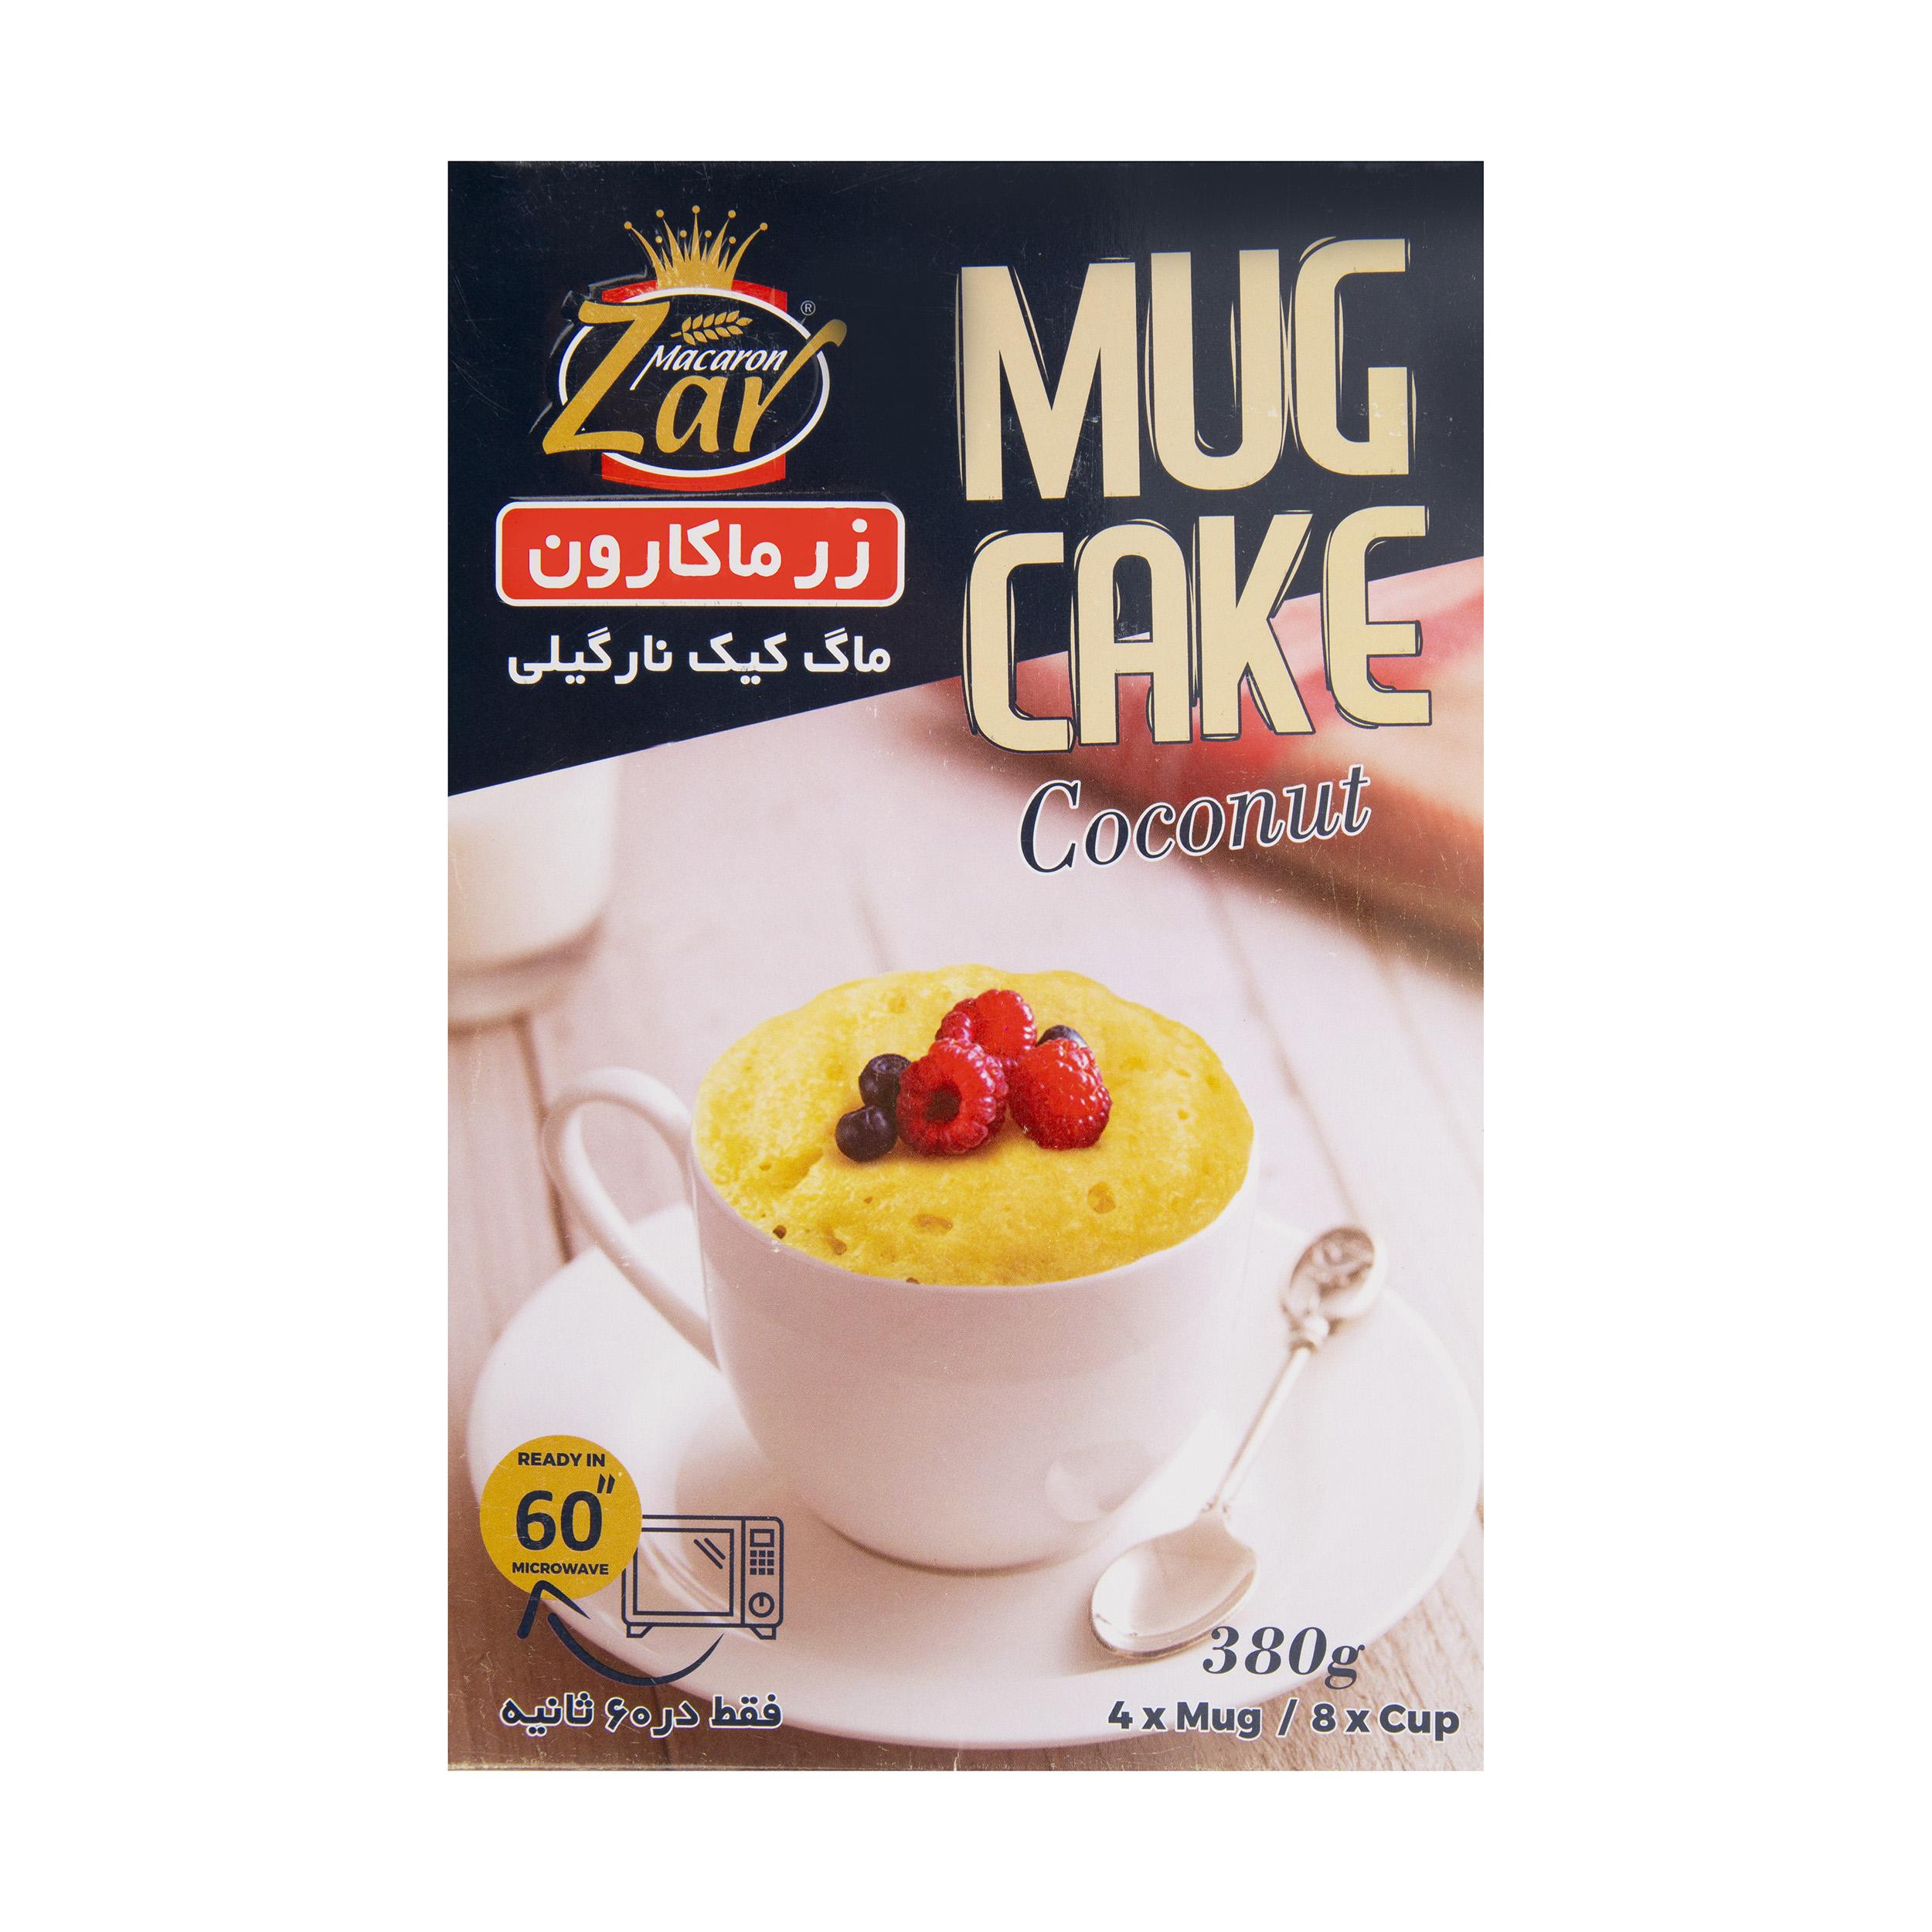 ماگ کیک نارگیلی زر ماکارون وزن 380 گرم